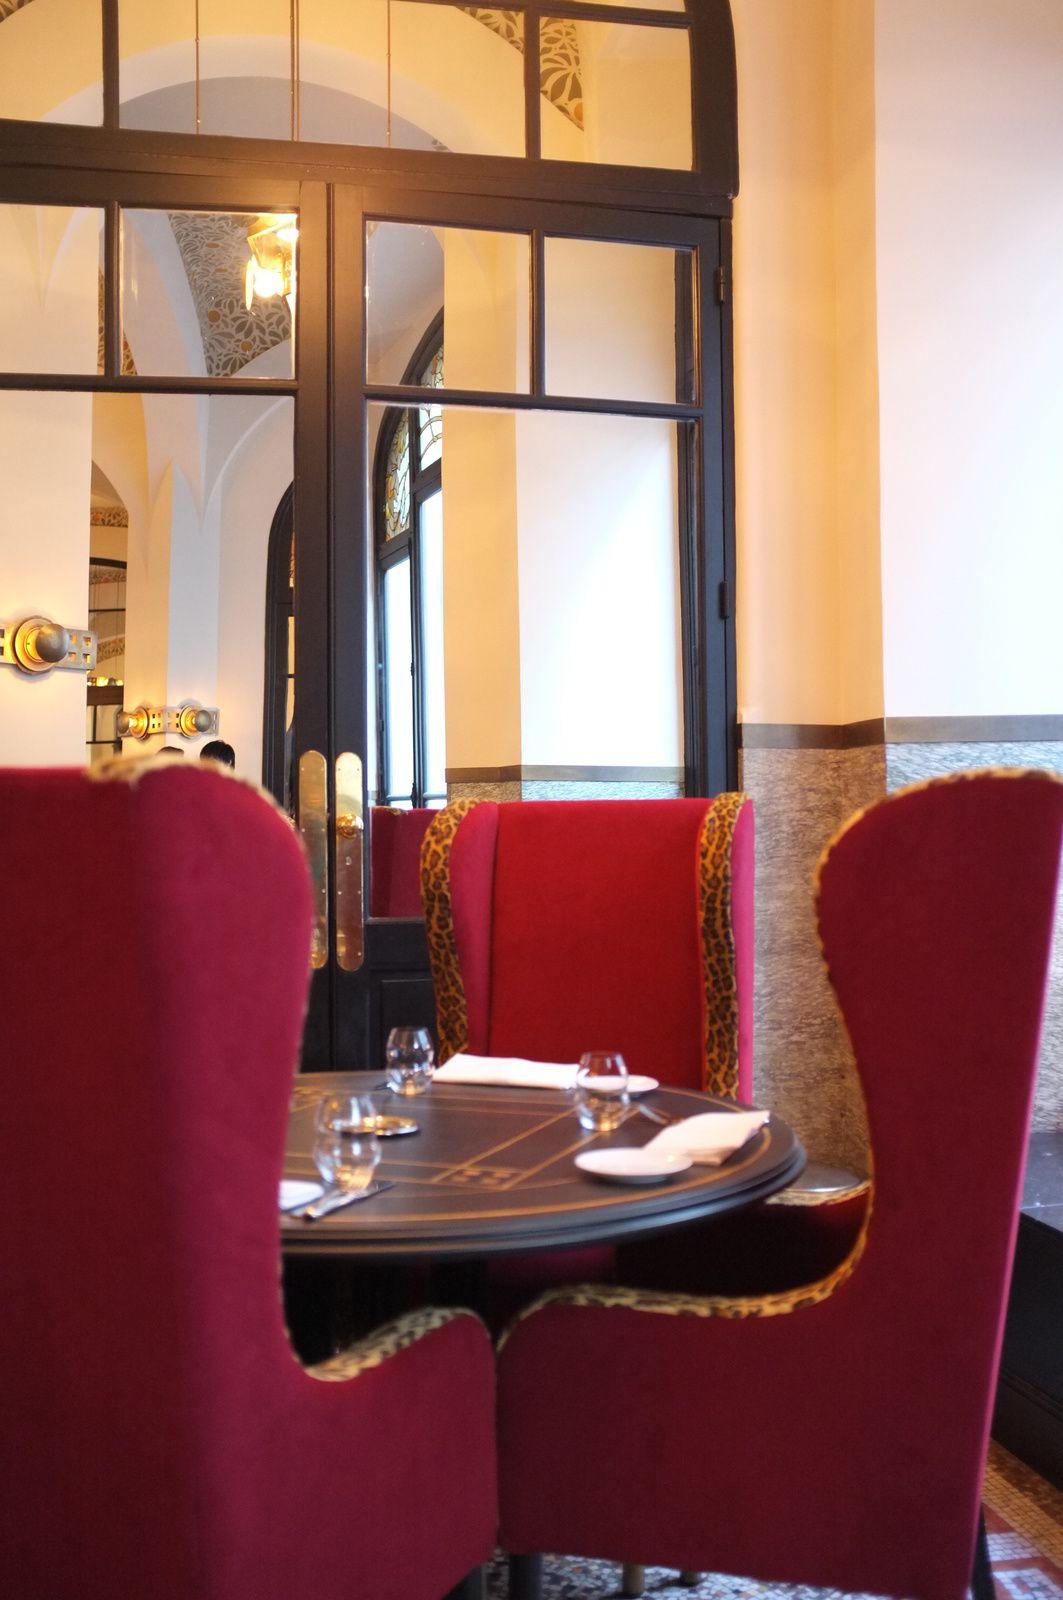 Cafe De Paris Gewurz In Bio